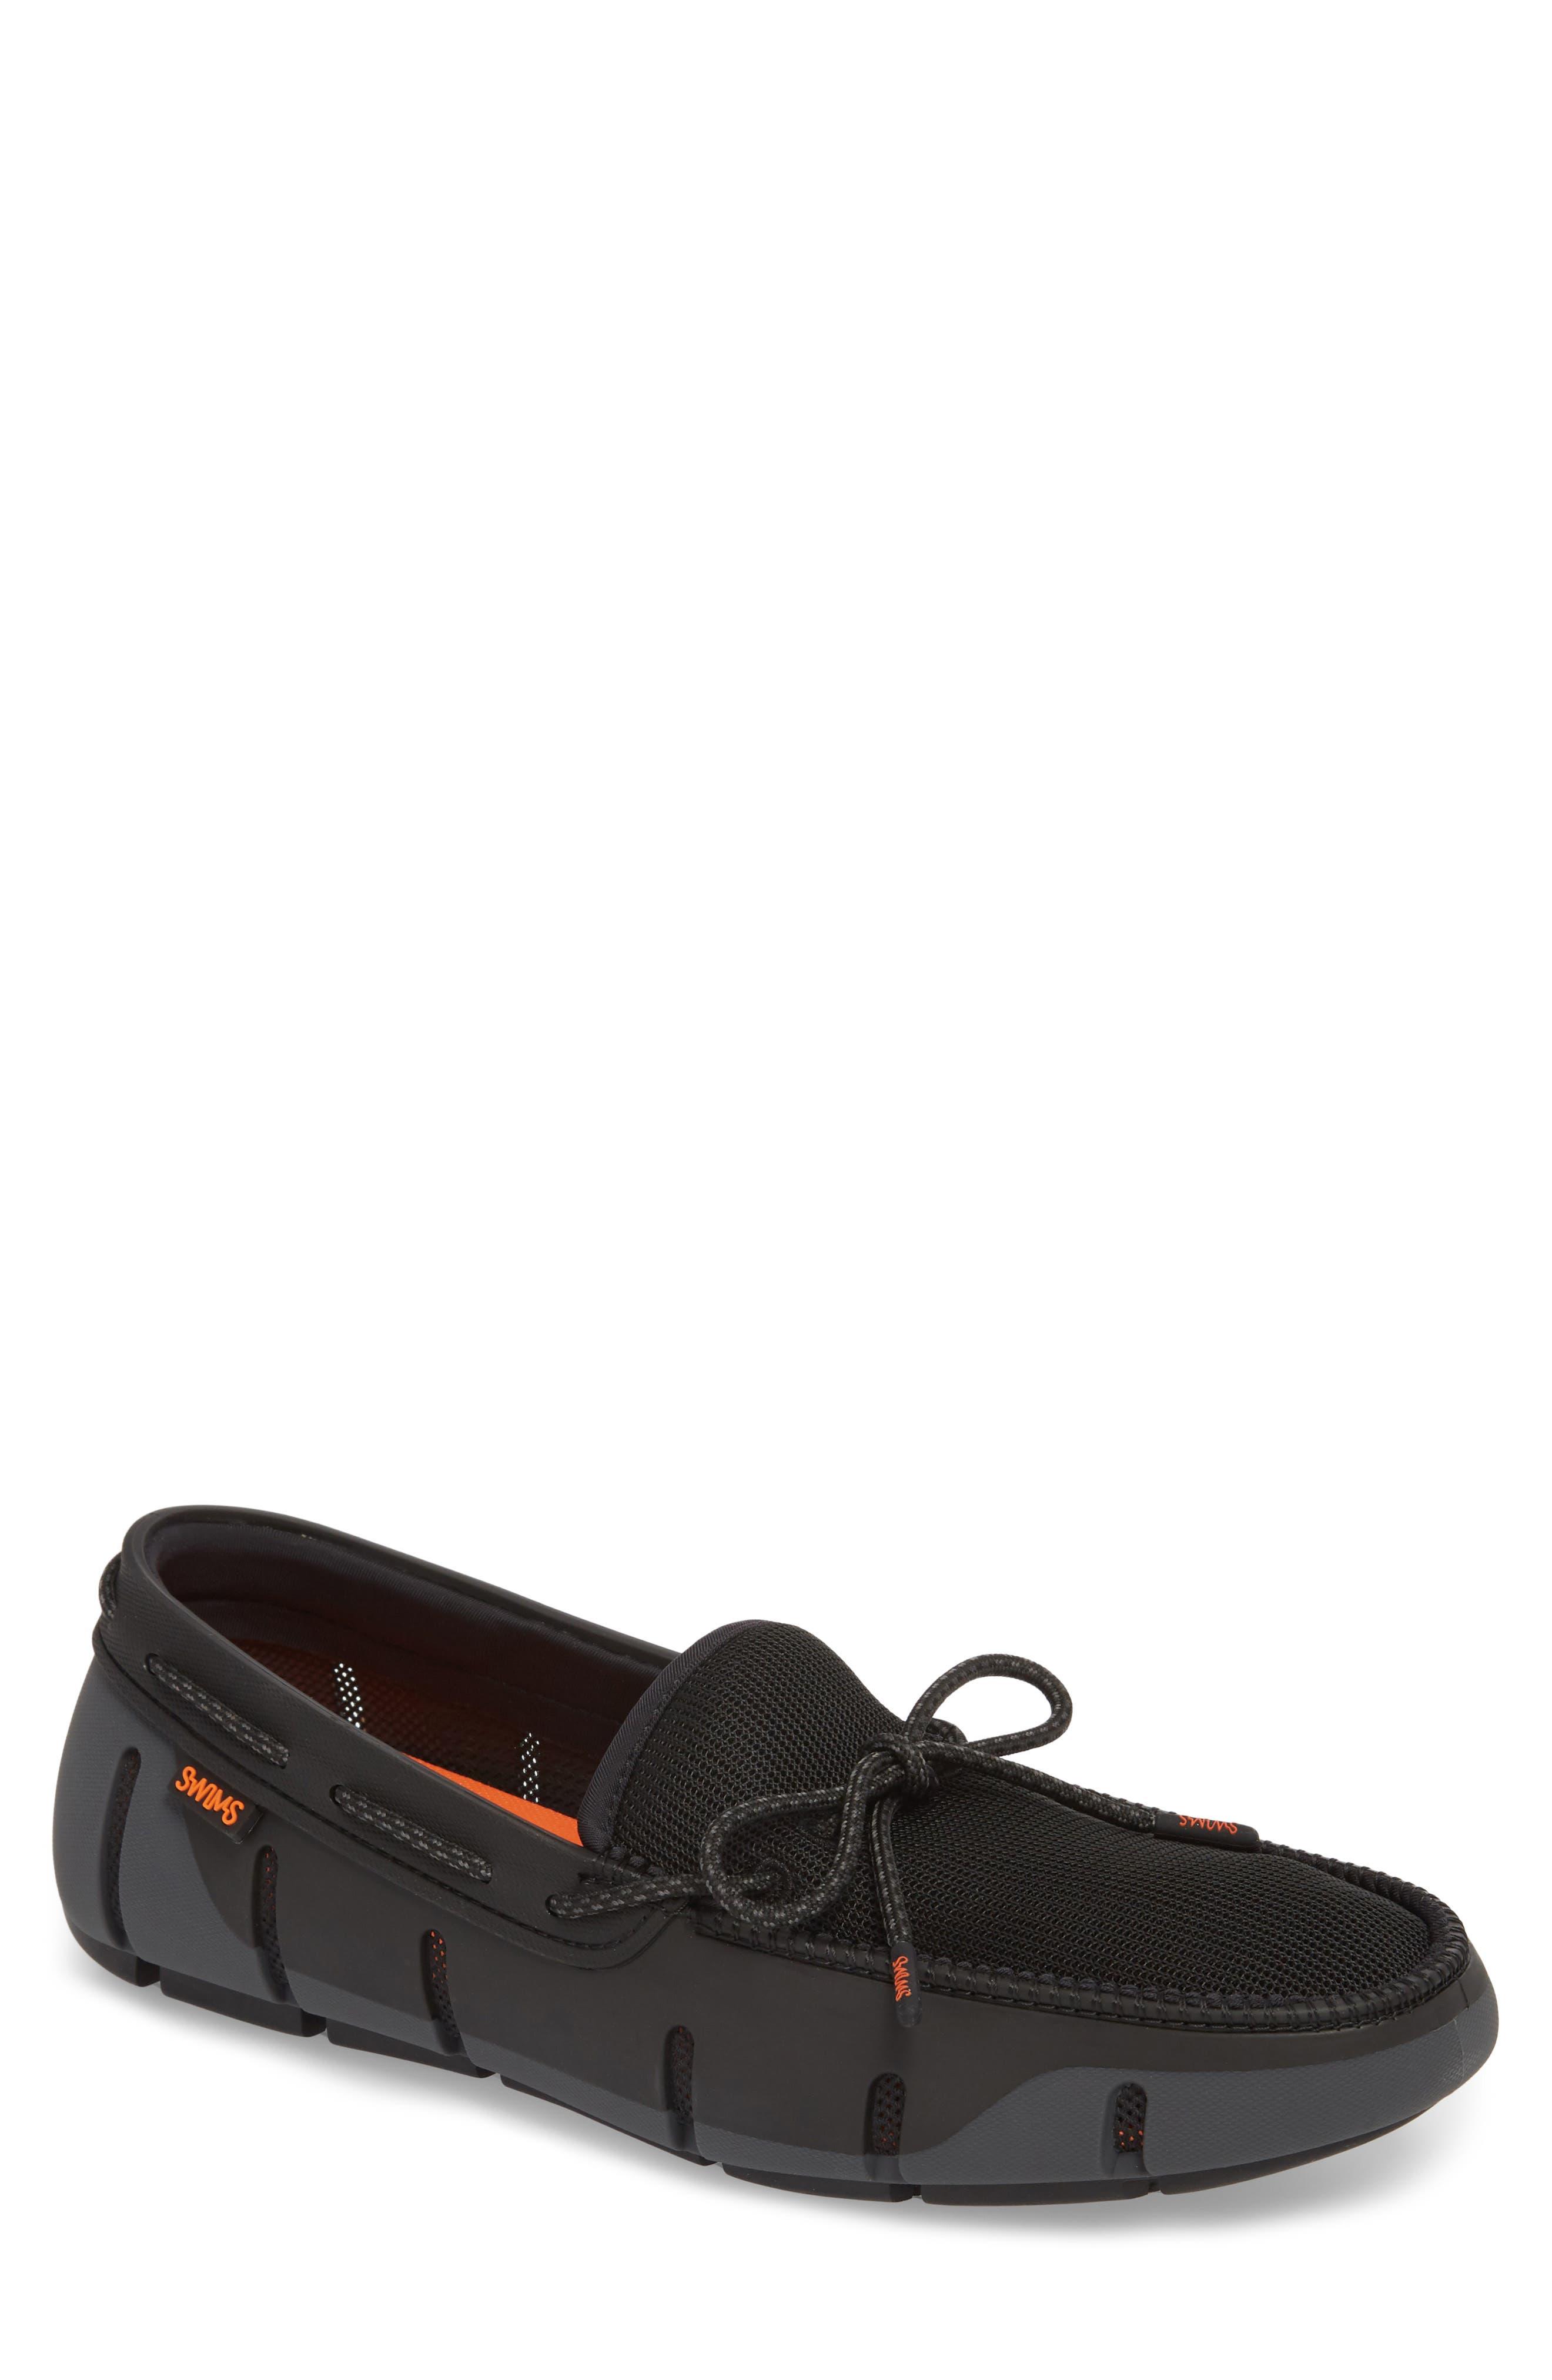 Stride Lace Loafer,                         Main,                         color, Black / Graphite Fleck